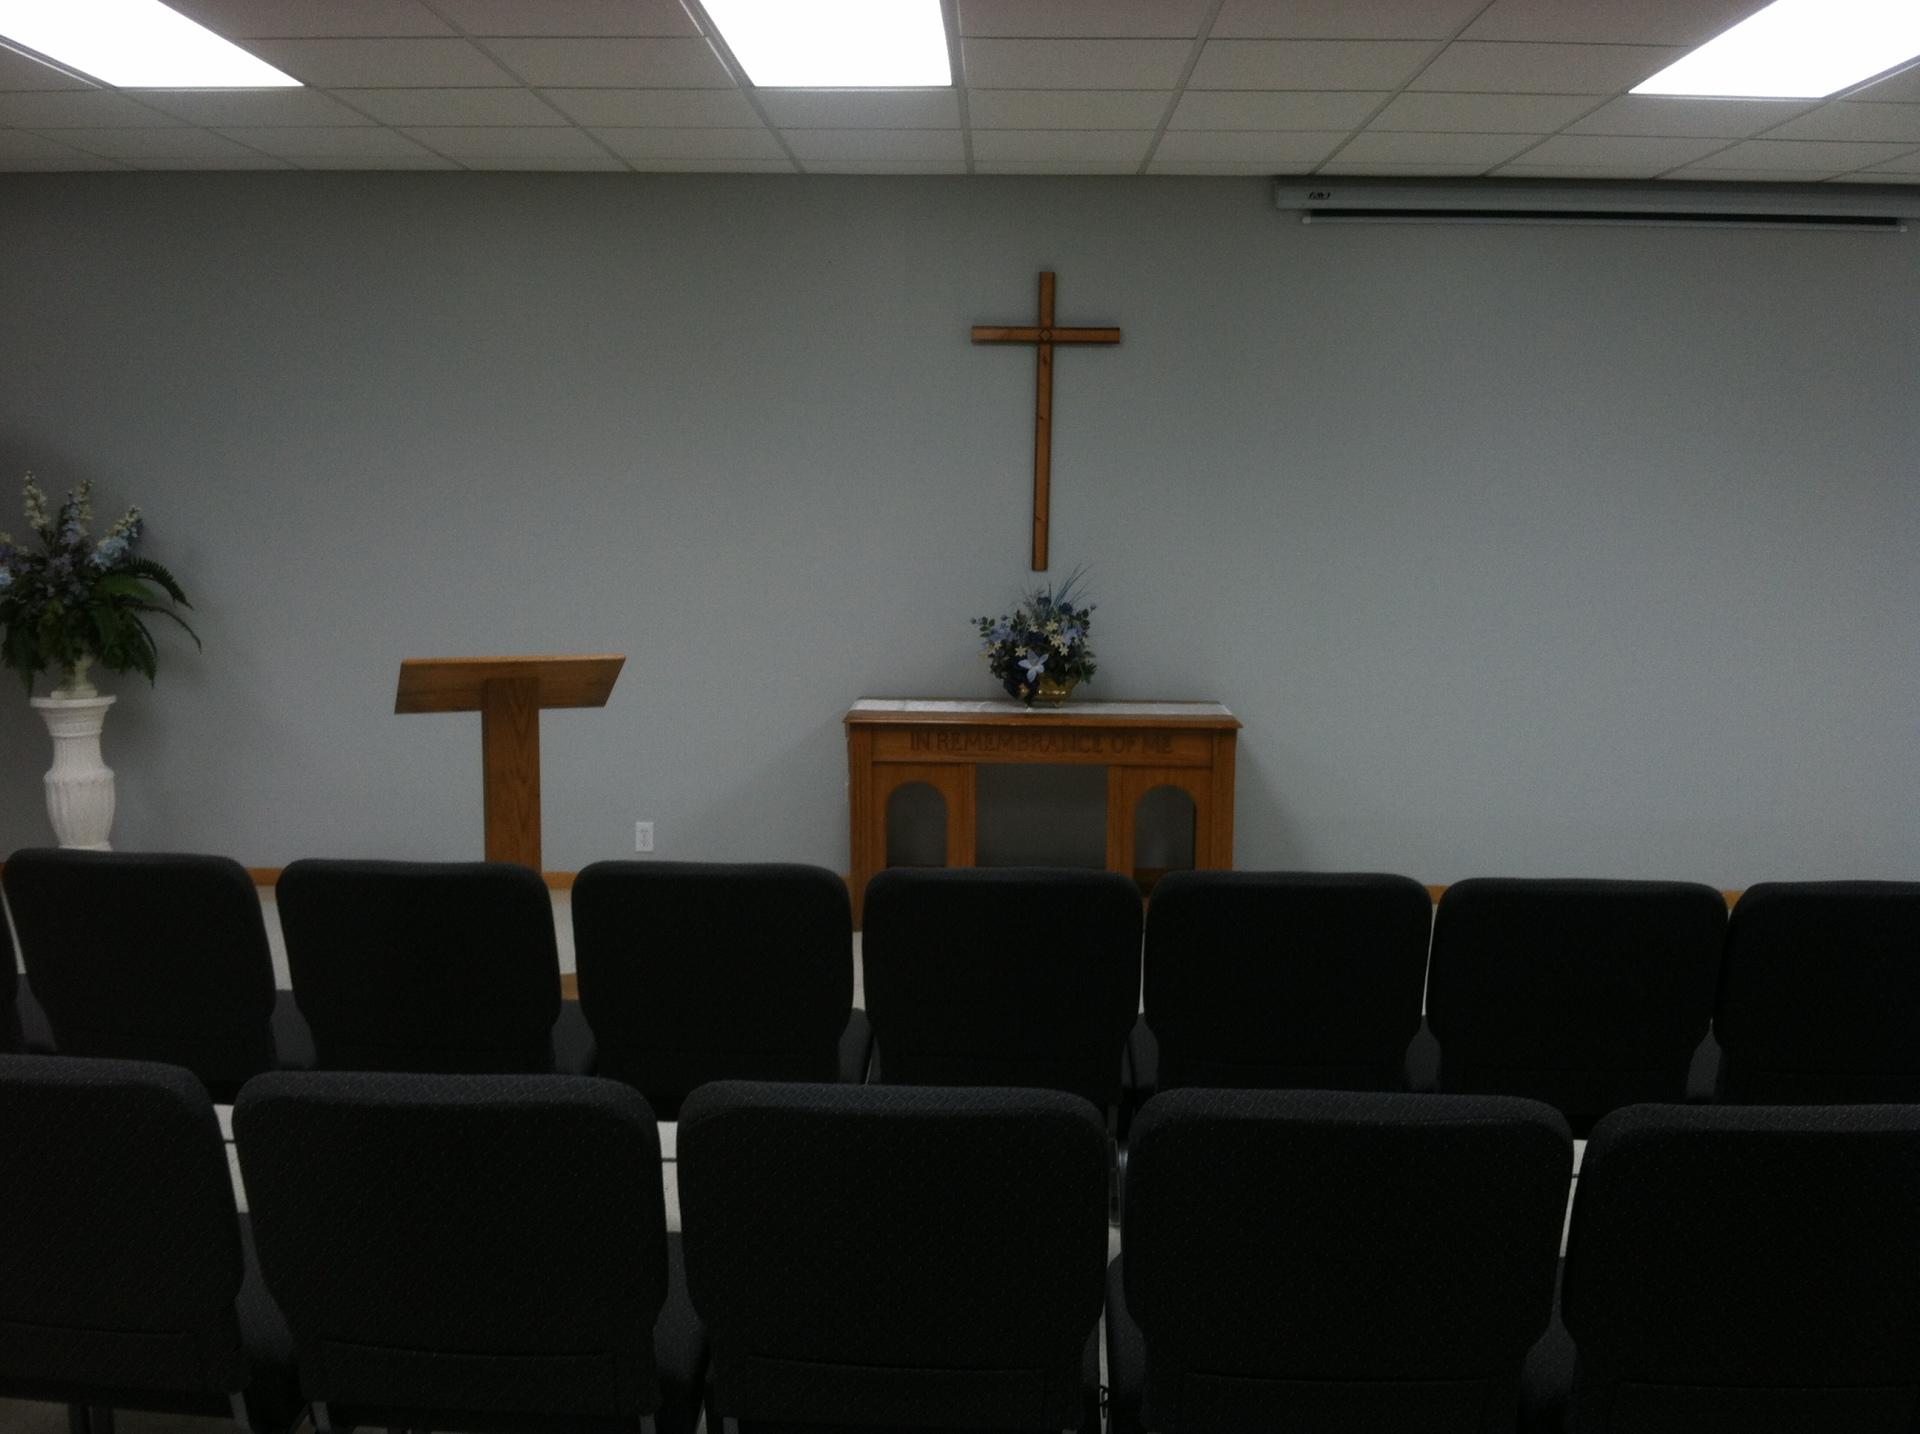 Our Old Sanctuary